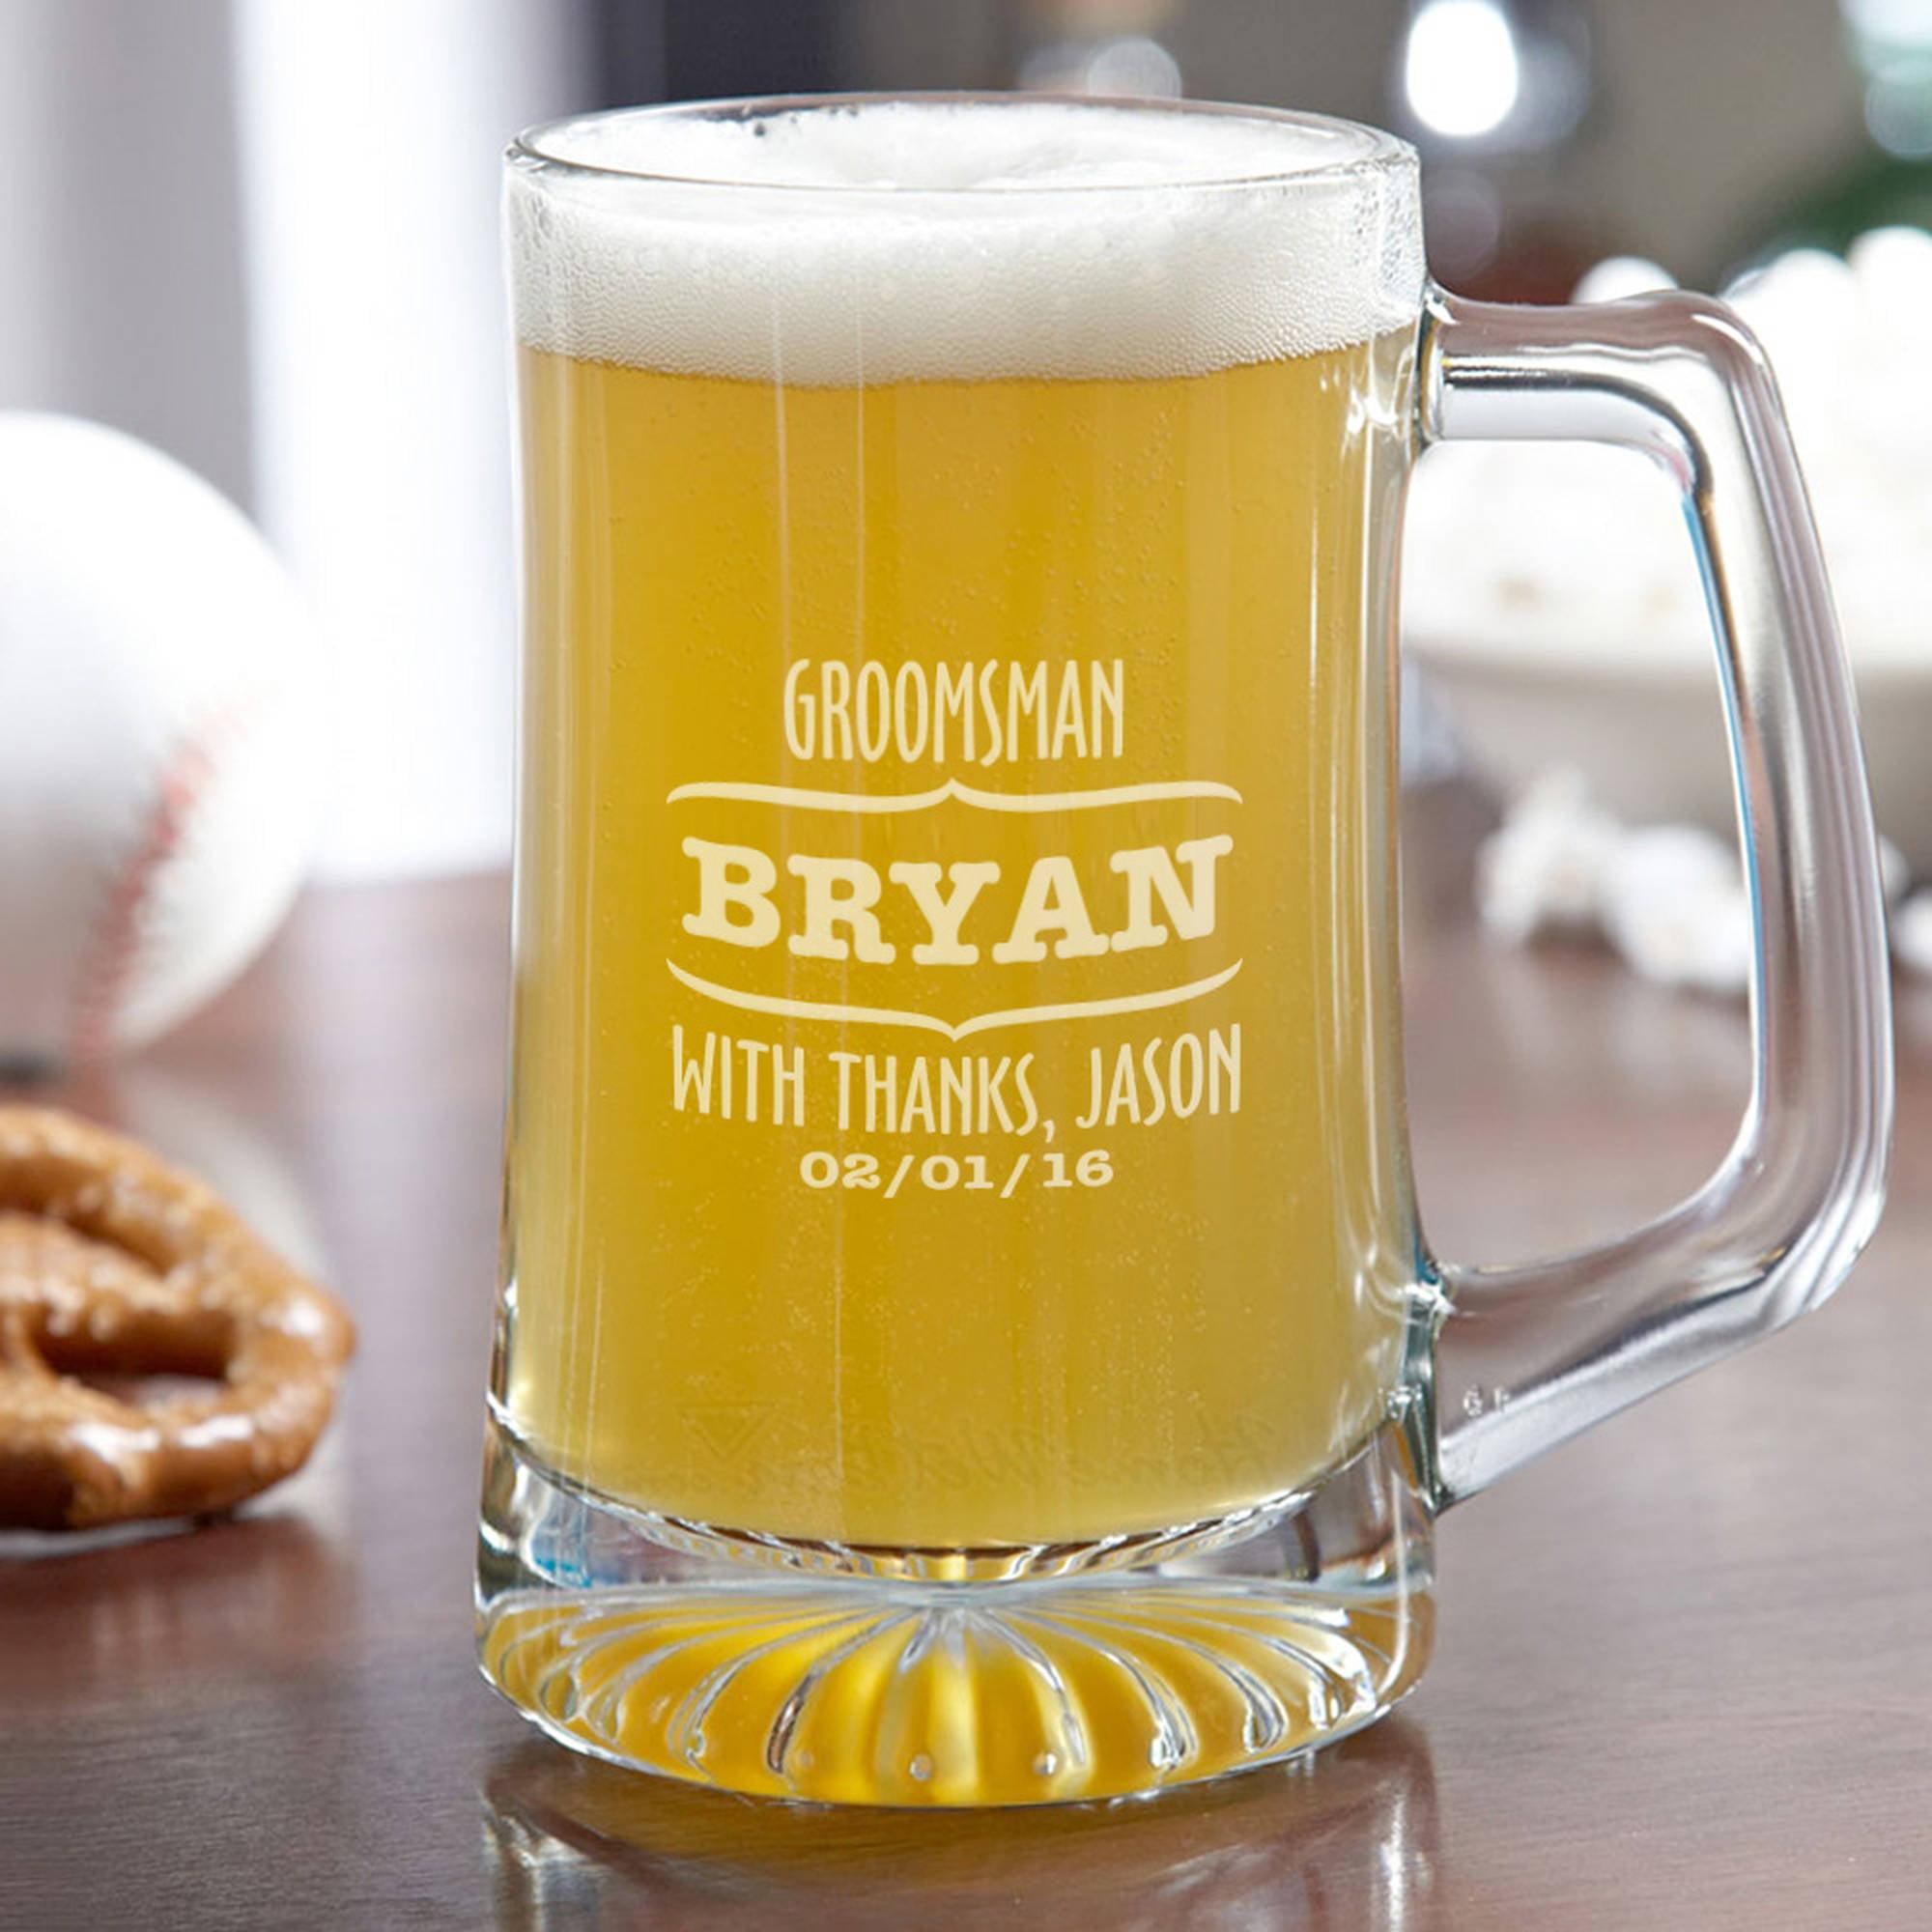 Wedding Party Personalized Groomsman Beer Mug, 15 oz